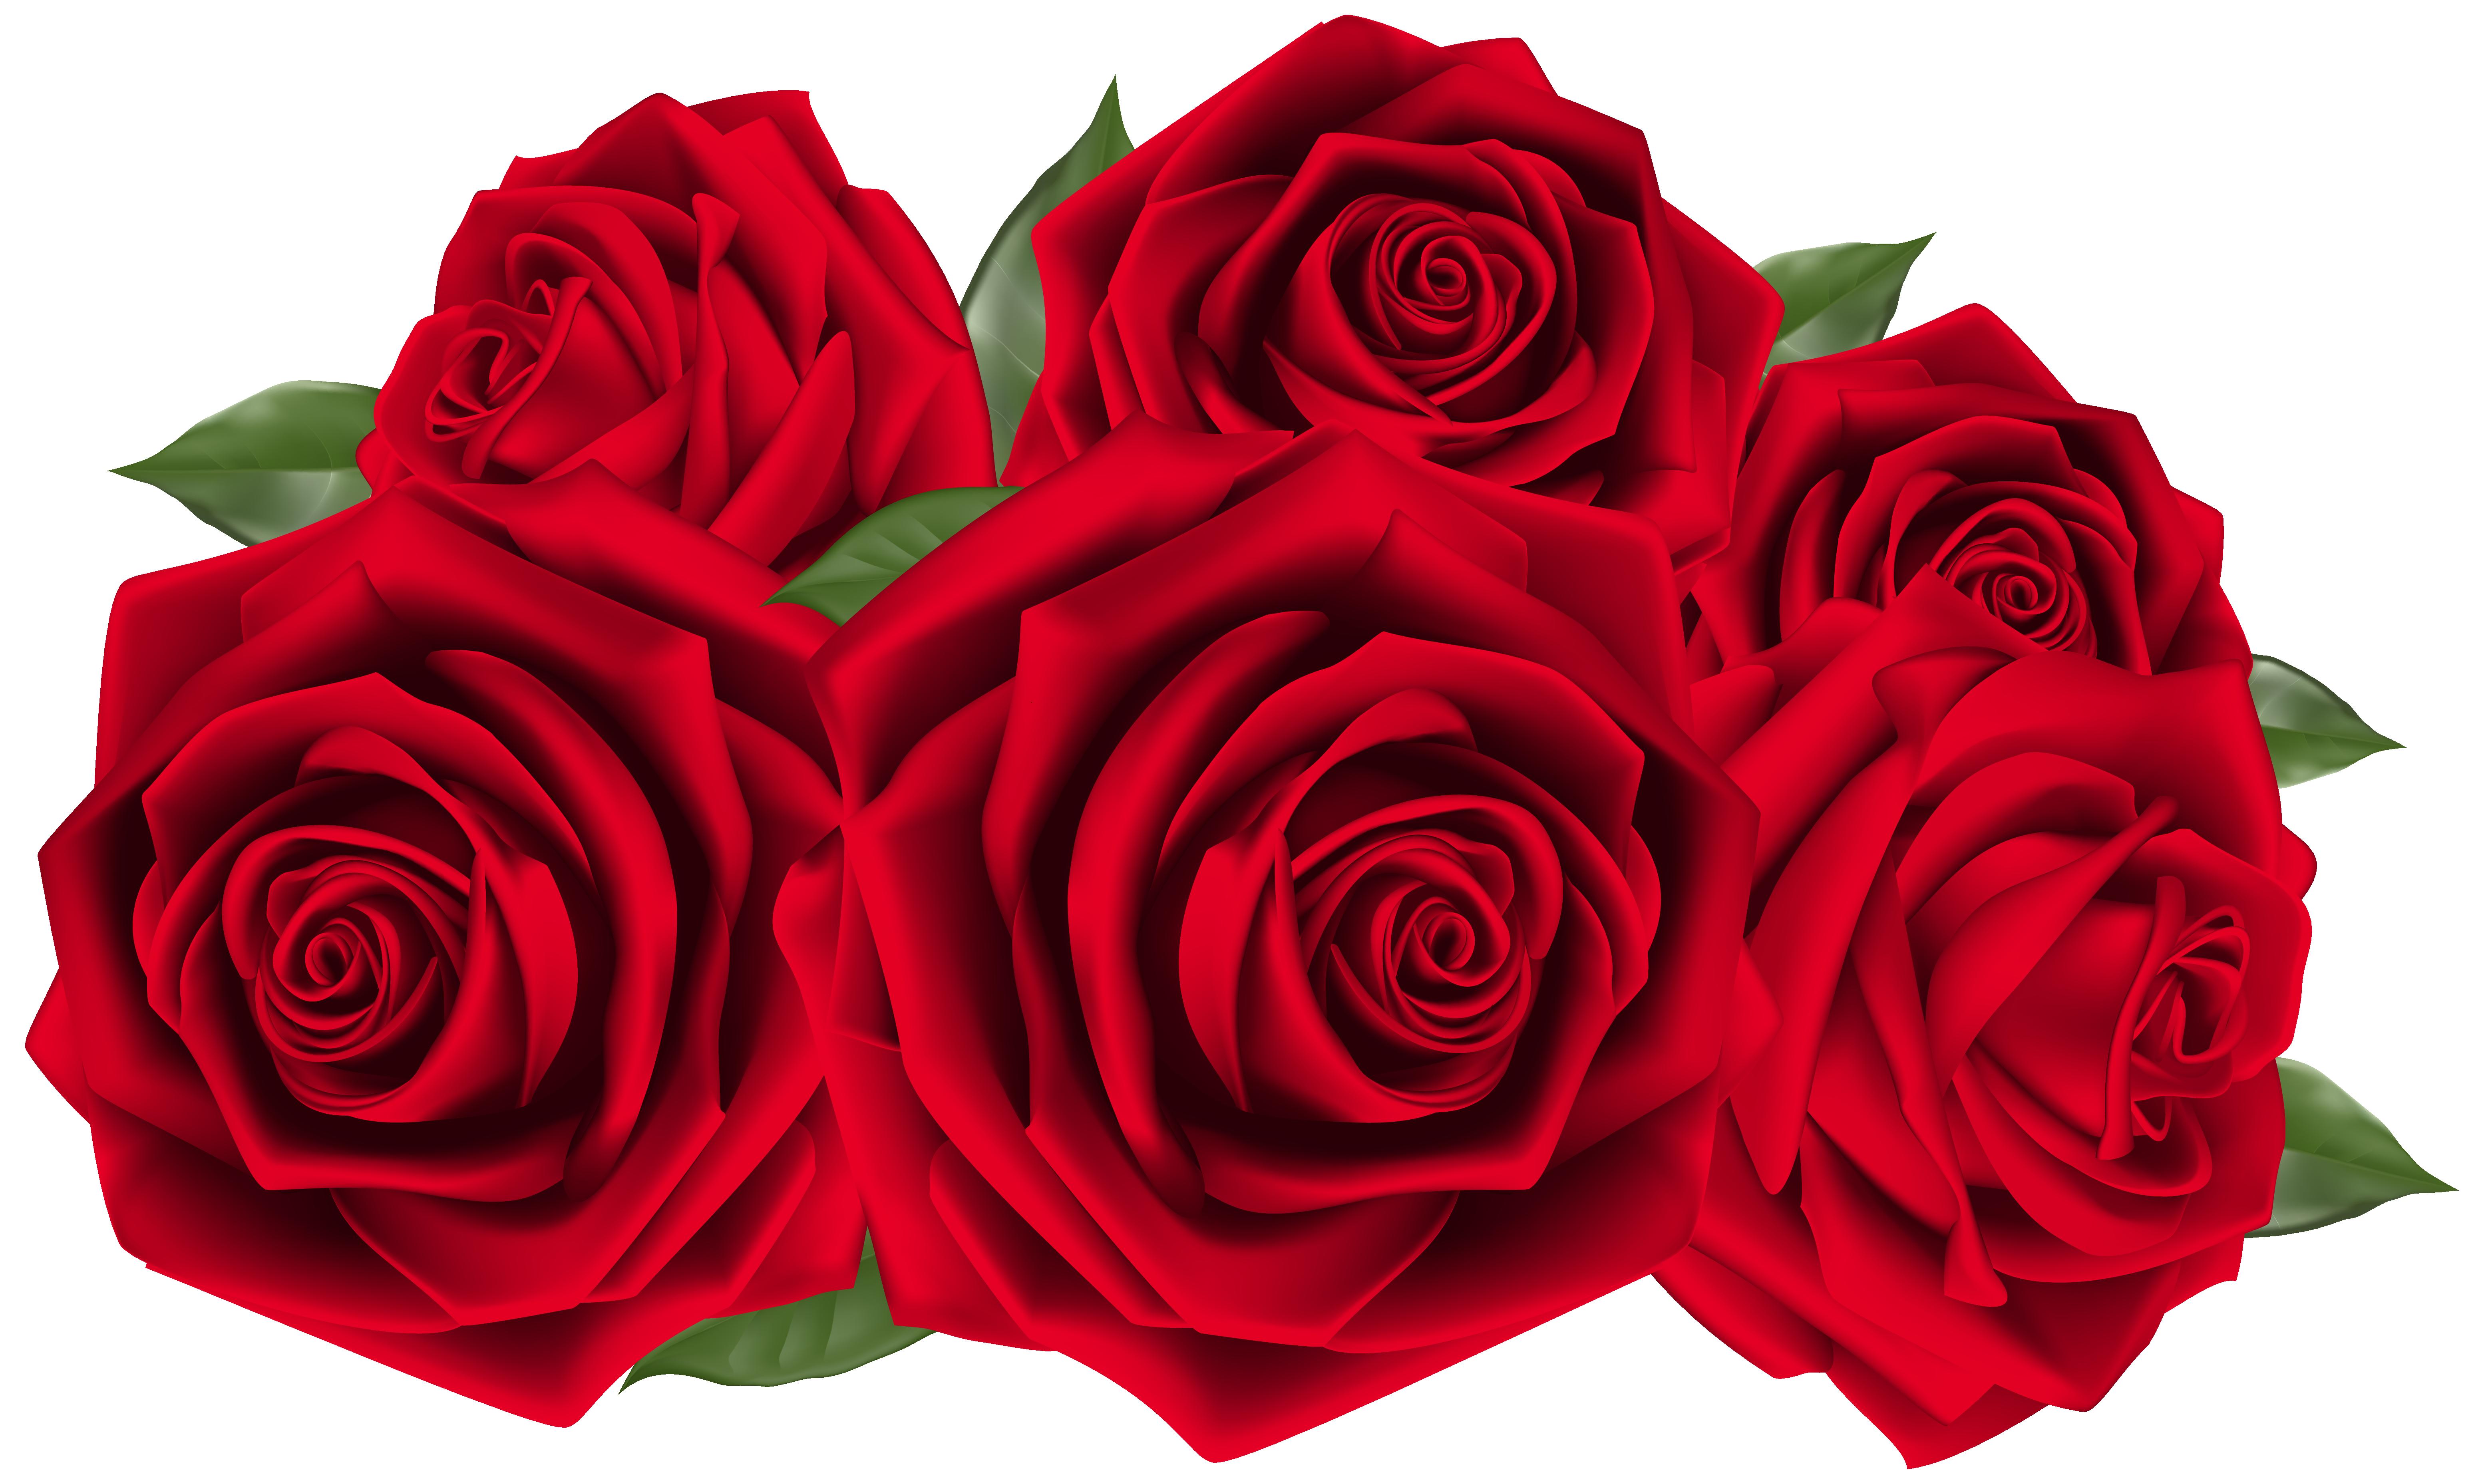 Tomatoes clipart arm leg. Beautiful dark red roses